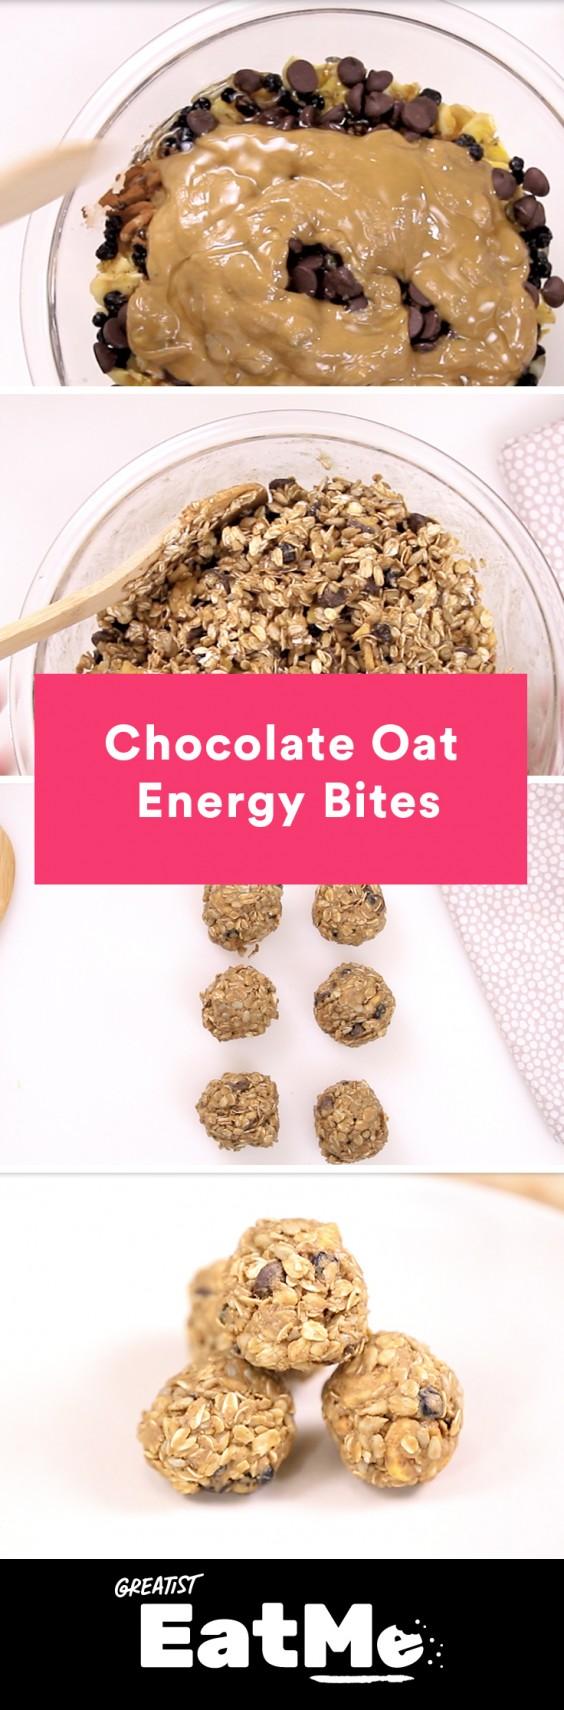 Eat Me Video: Chocolate Oat Energy Bites